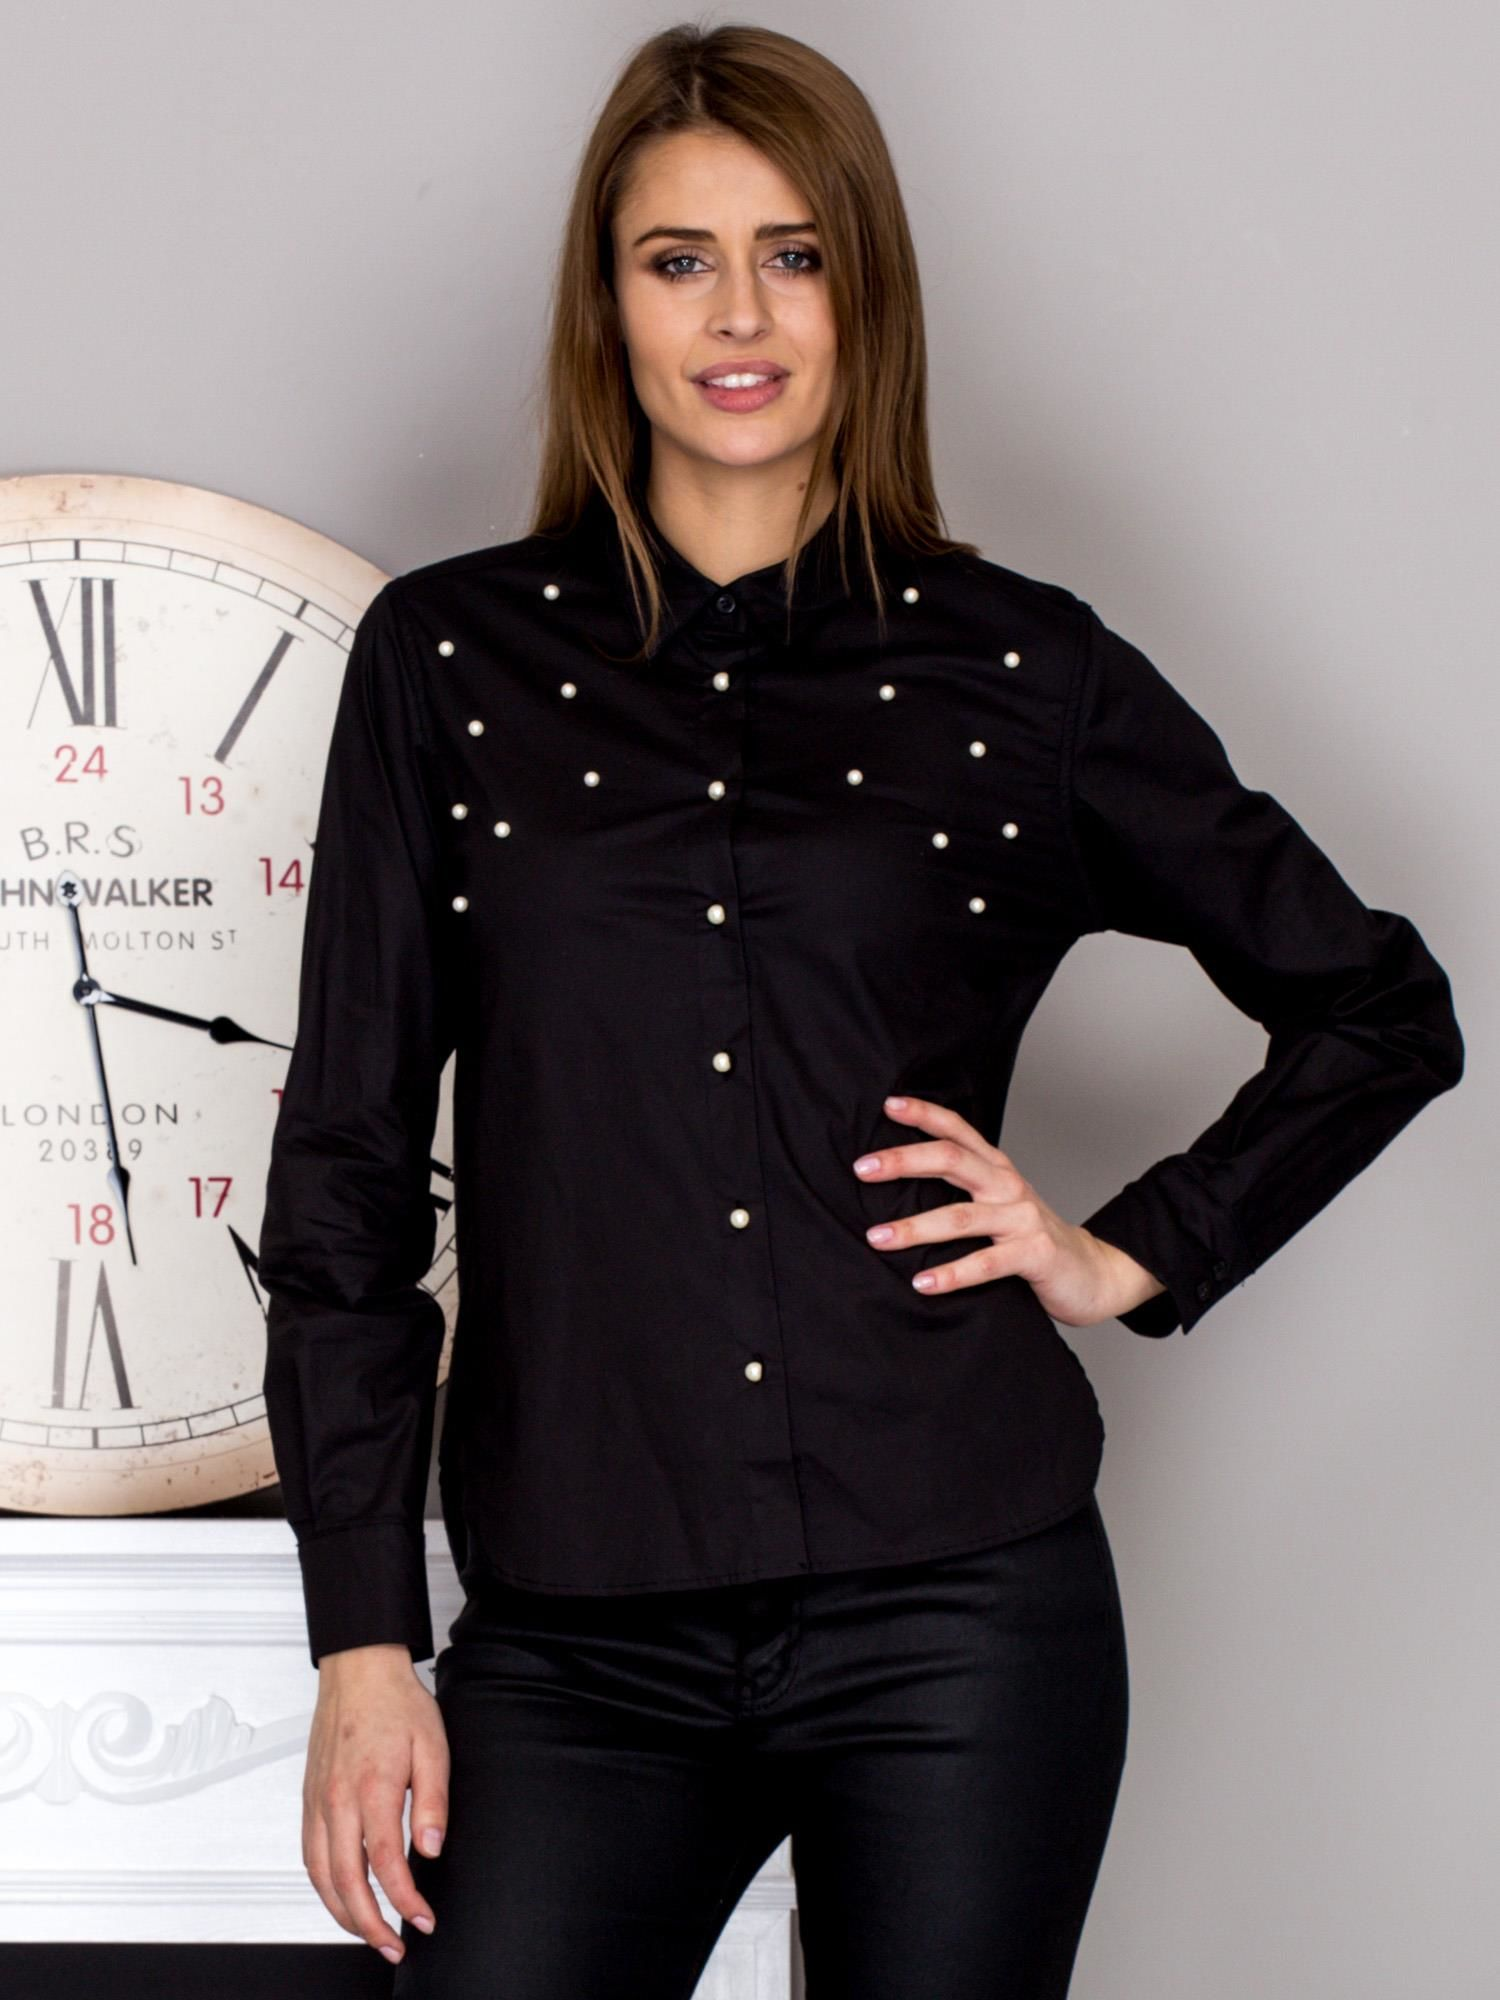 b24072a6f5 Koszula damska z perełkami czarna - Koszula z perełkami - sklep eButik.pl